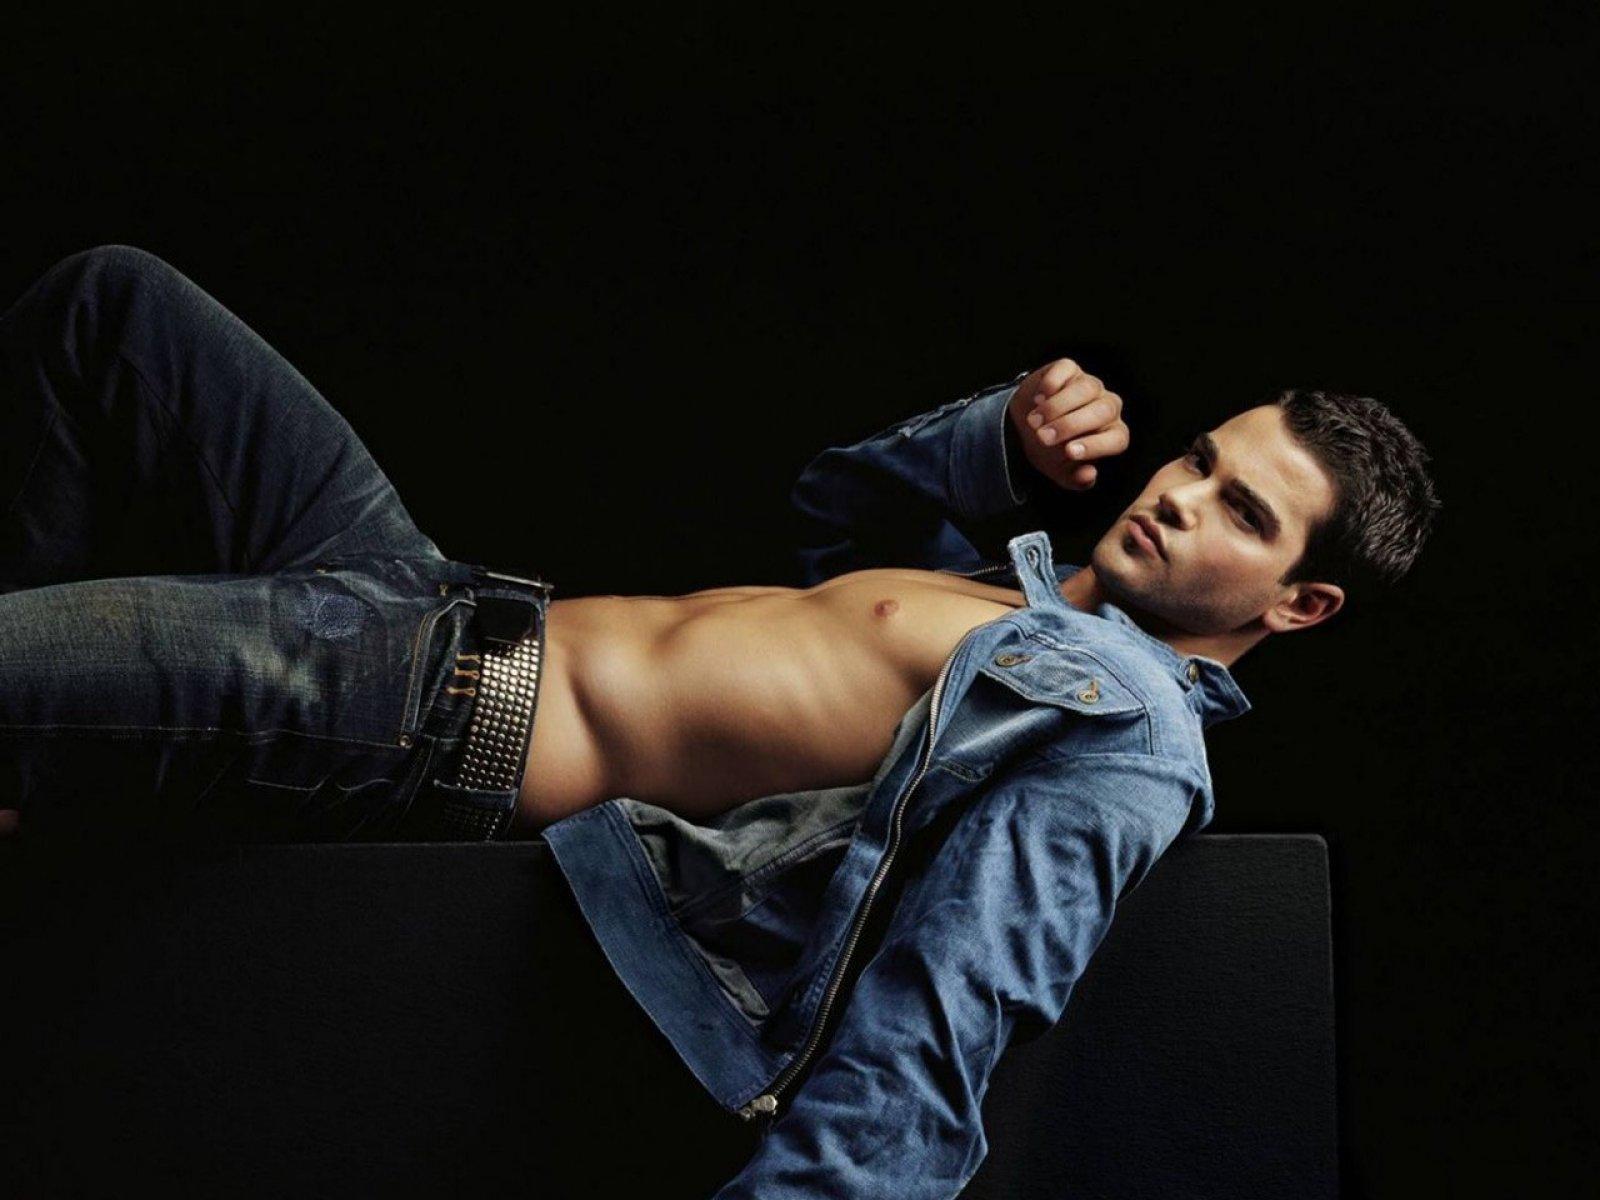 Jeans Gay Erotica Naked Men Photos